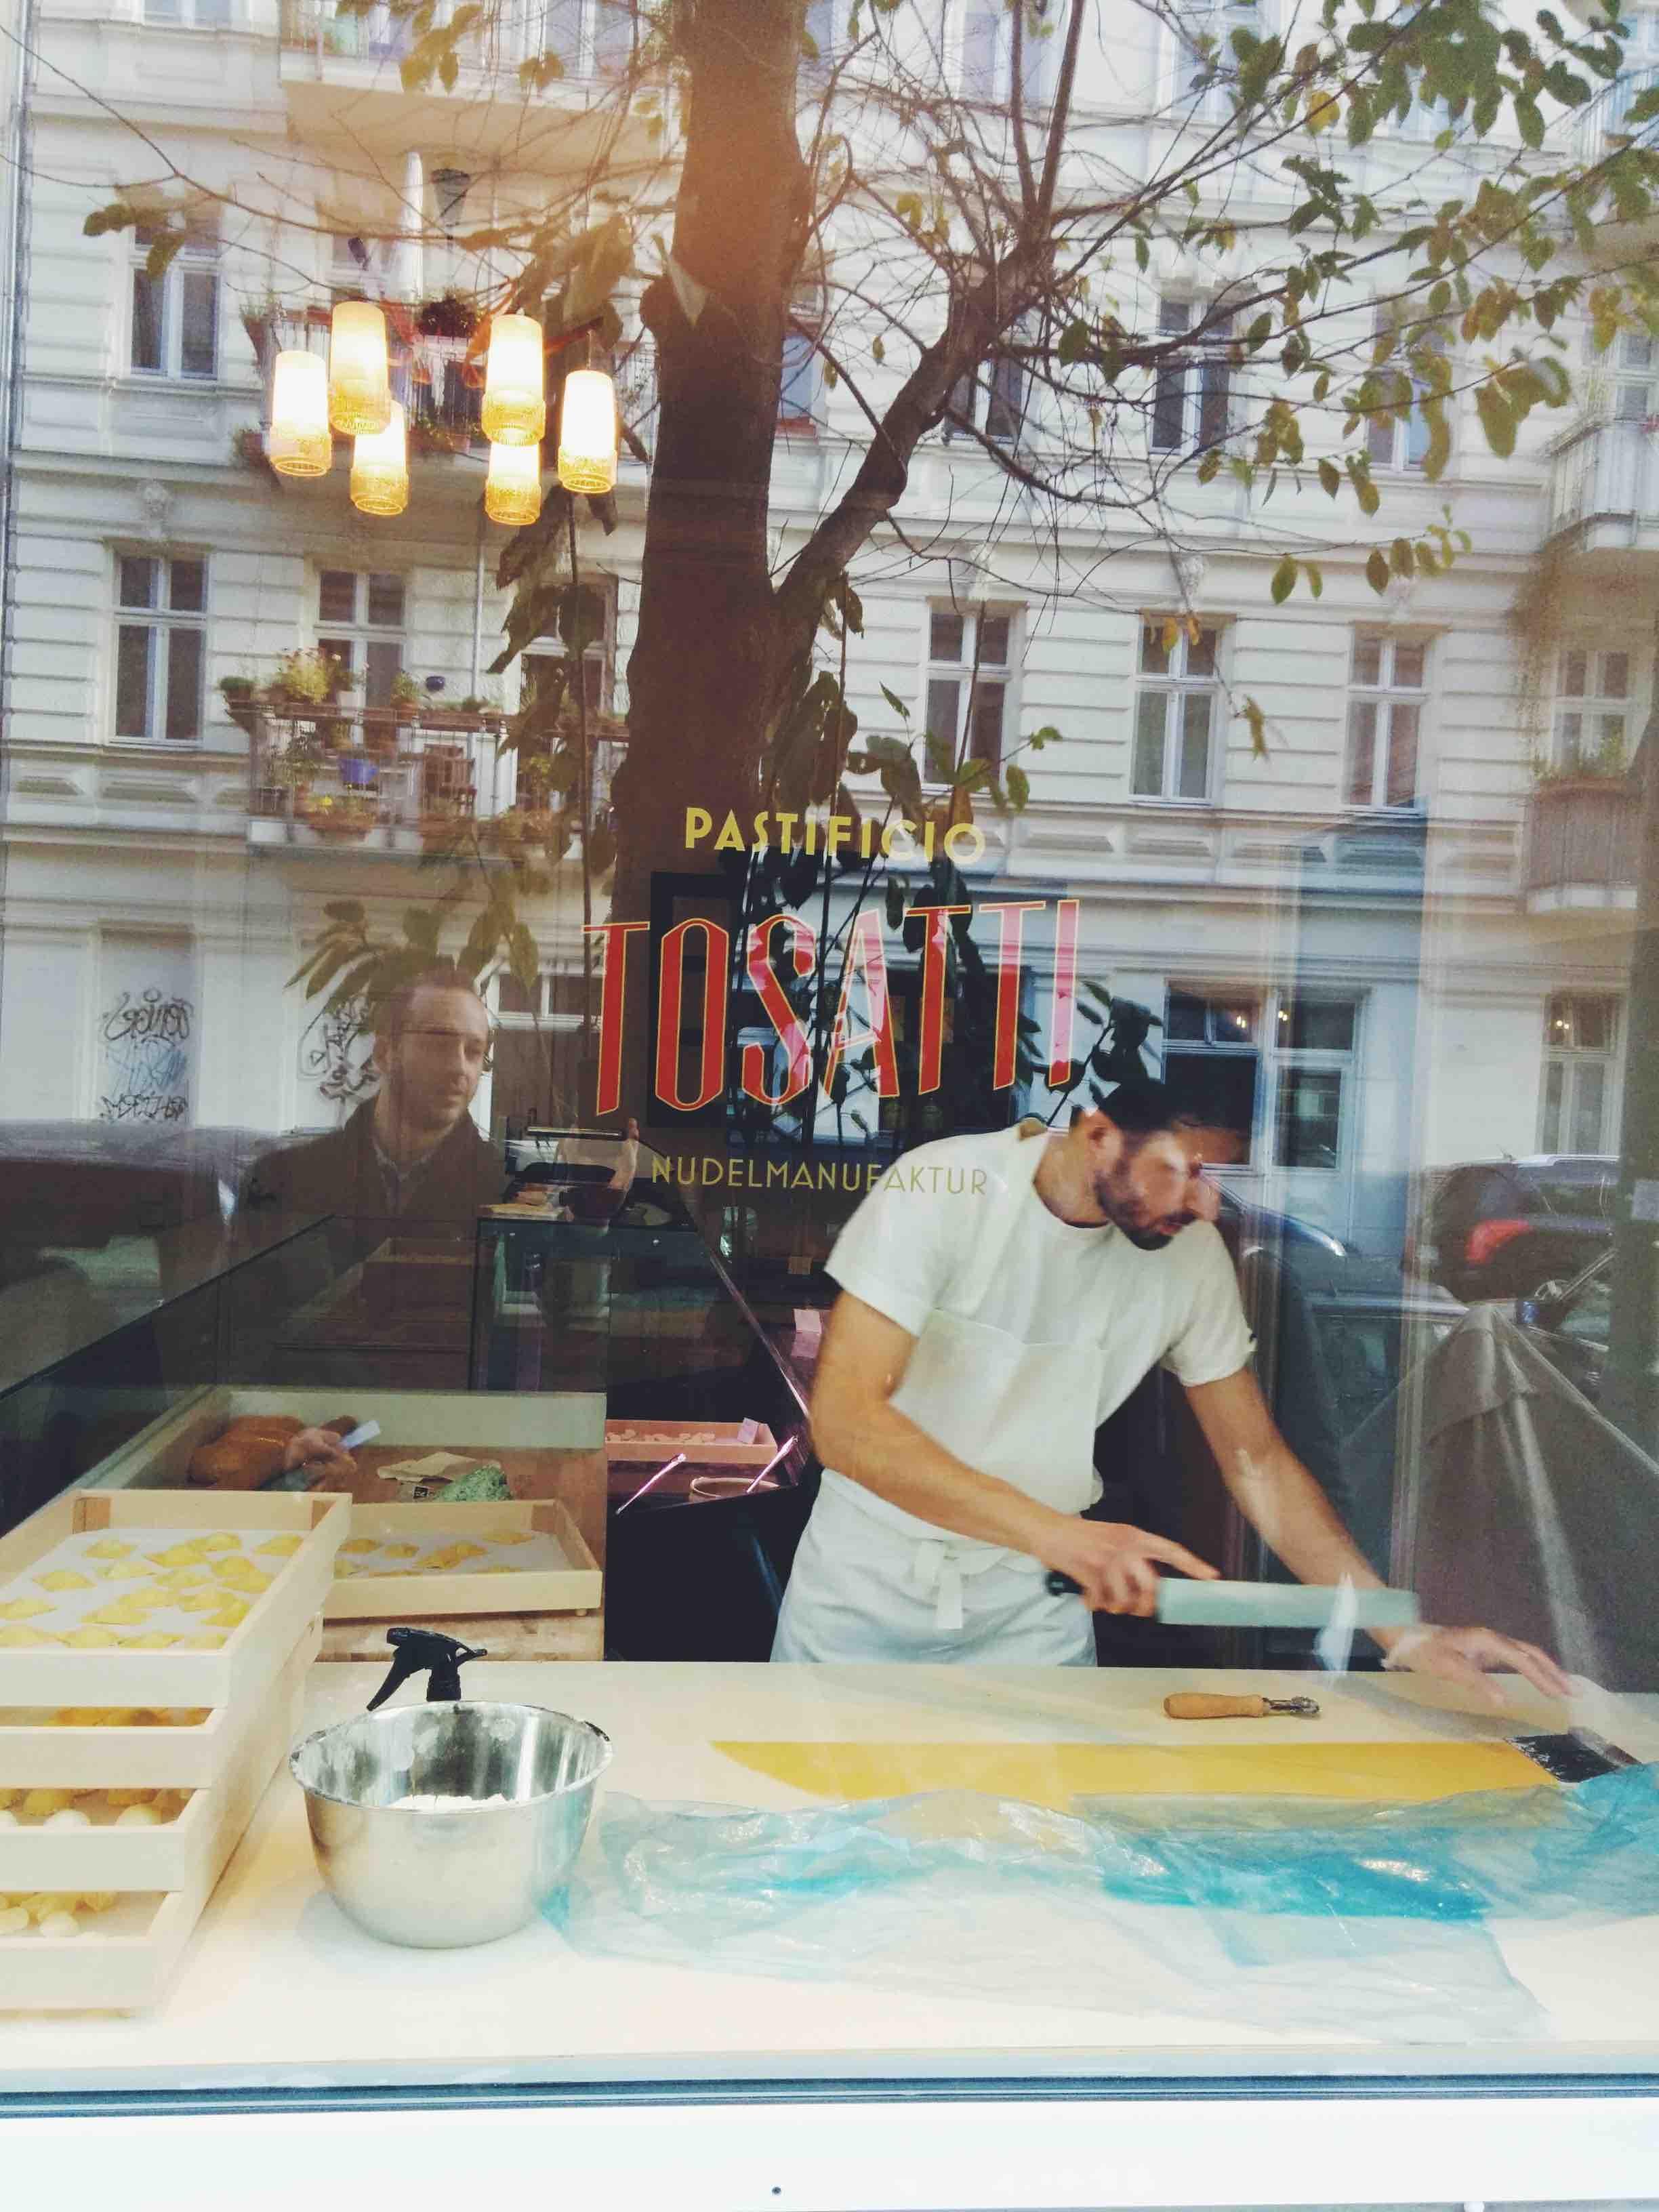 Pastificio Tosatti Handmade Pasta Passion Pasta Restaurants Pasta Bar Pasta Shop